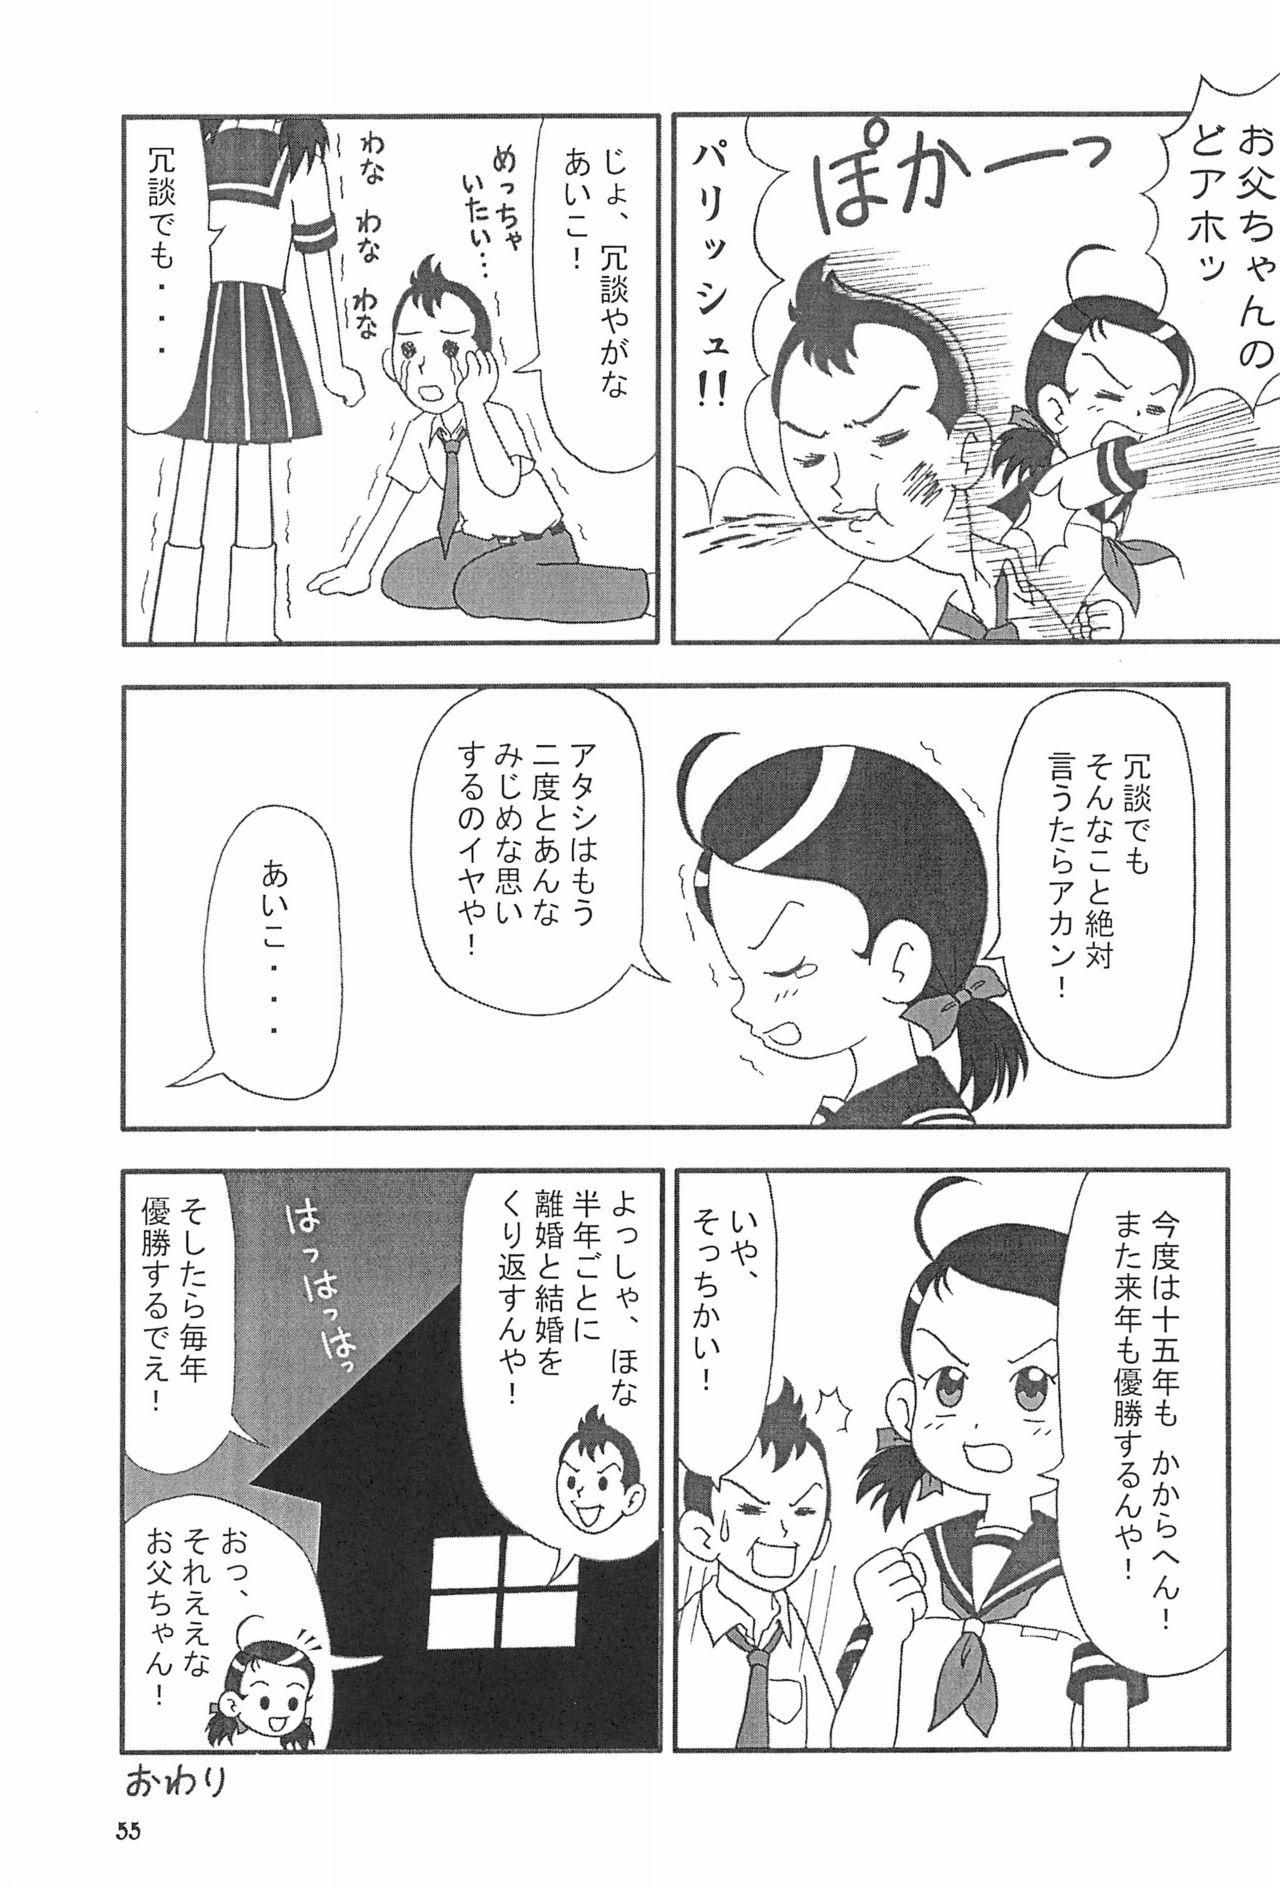 Momo no Kanzume 54